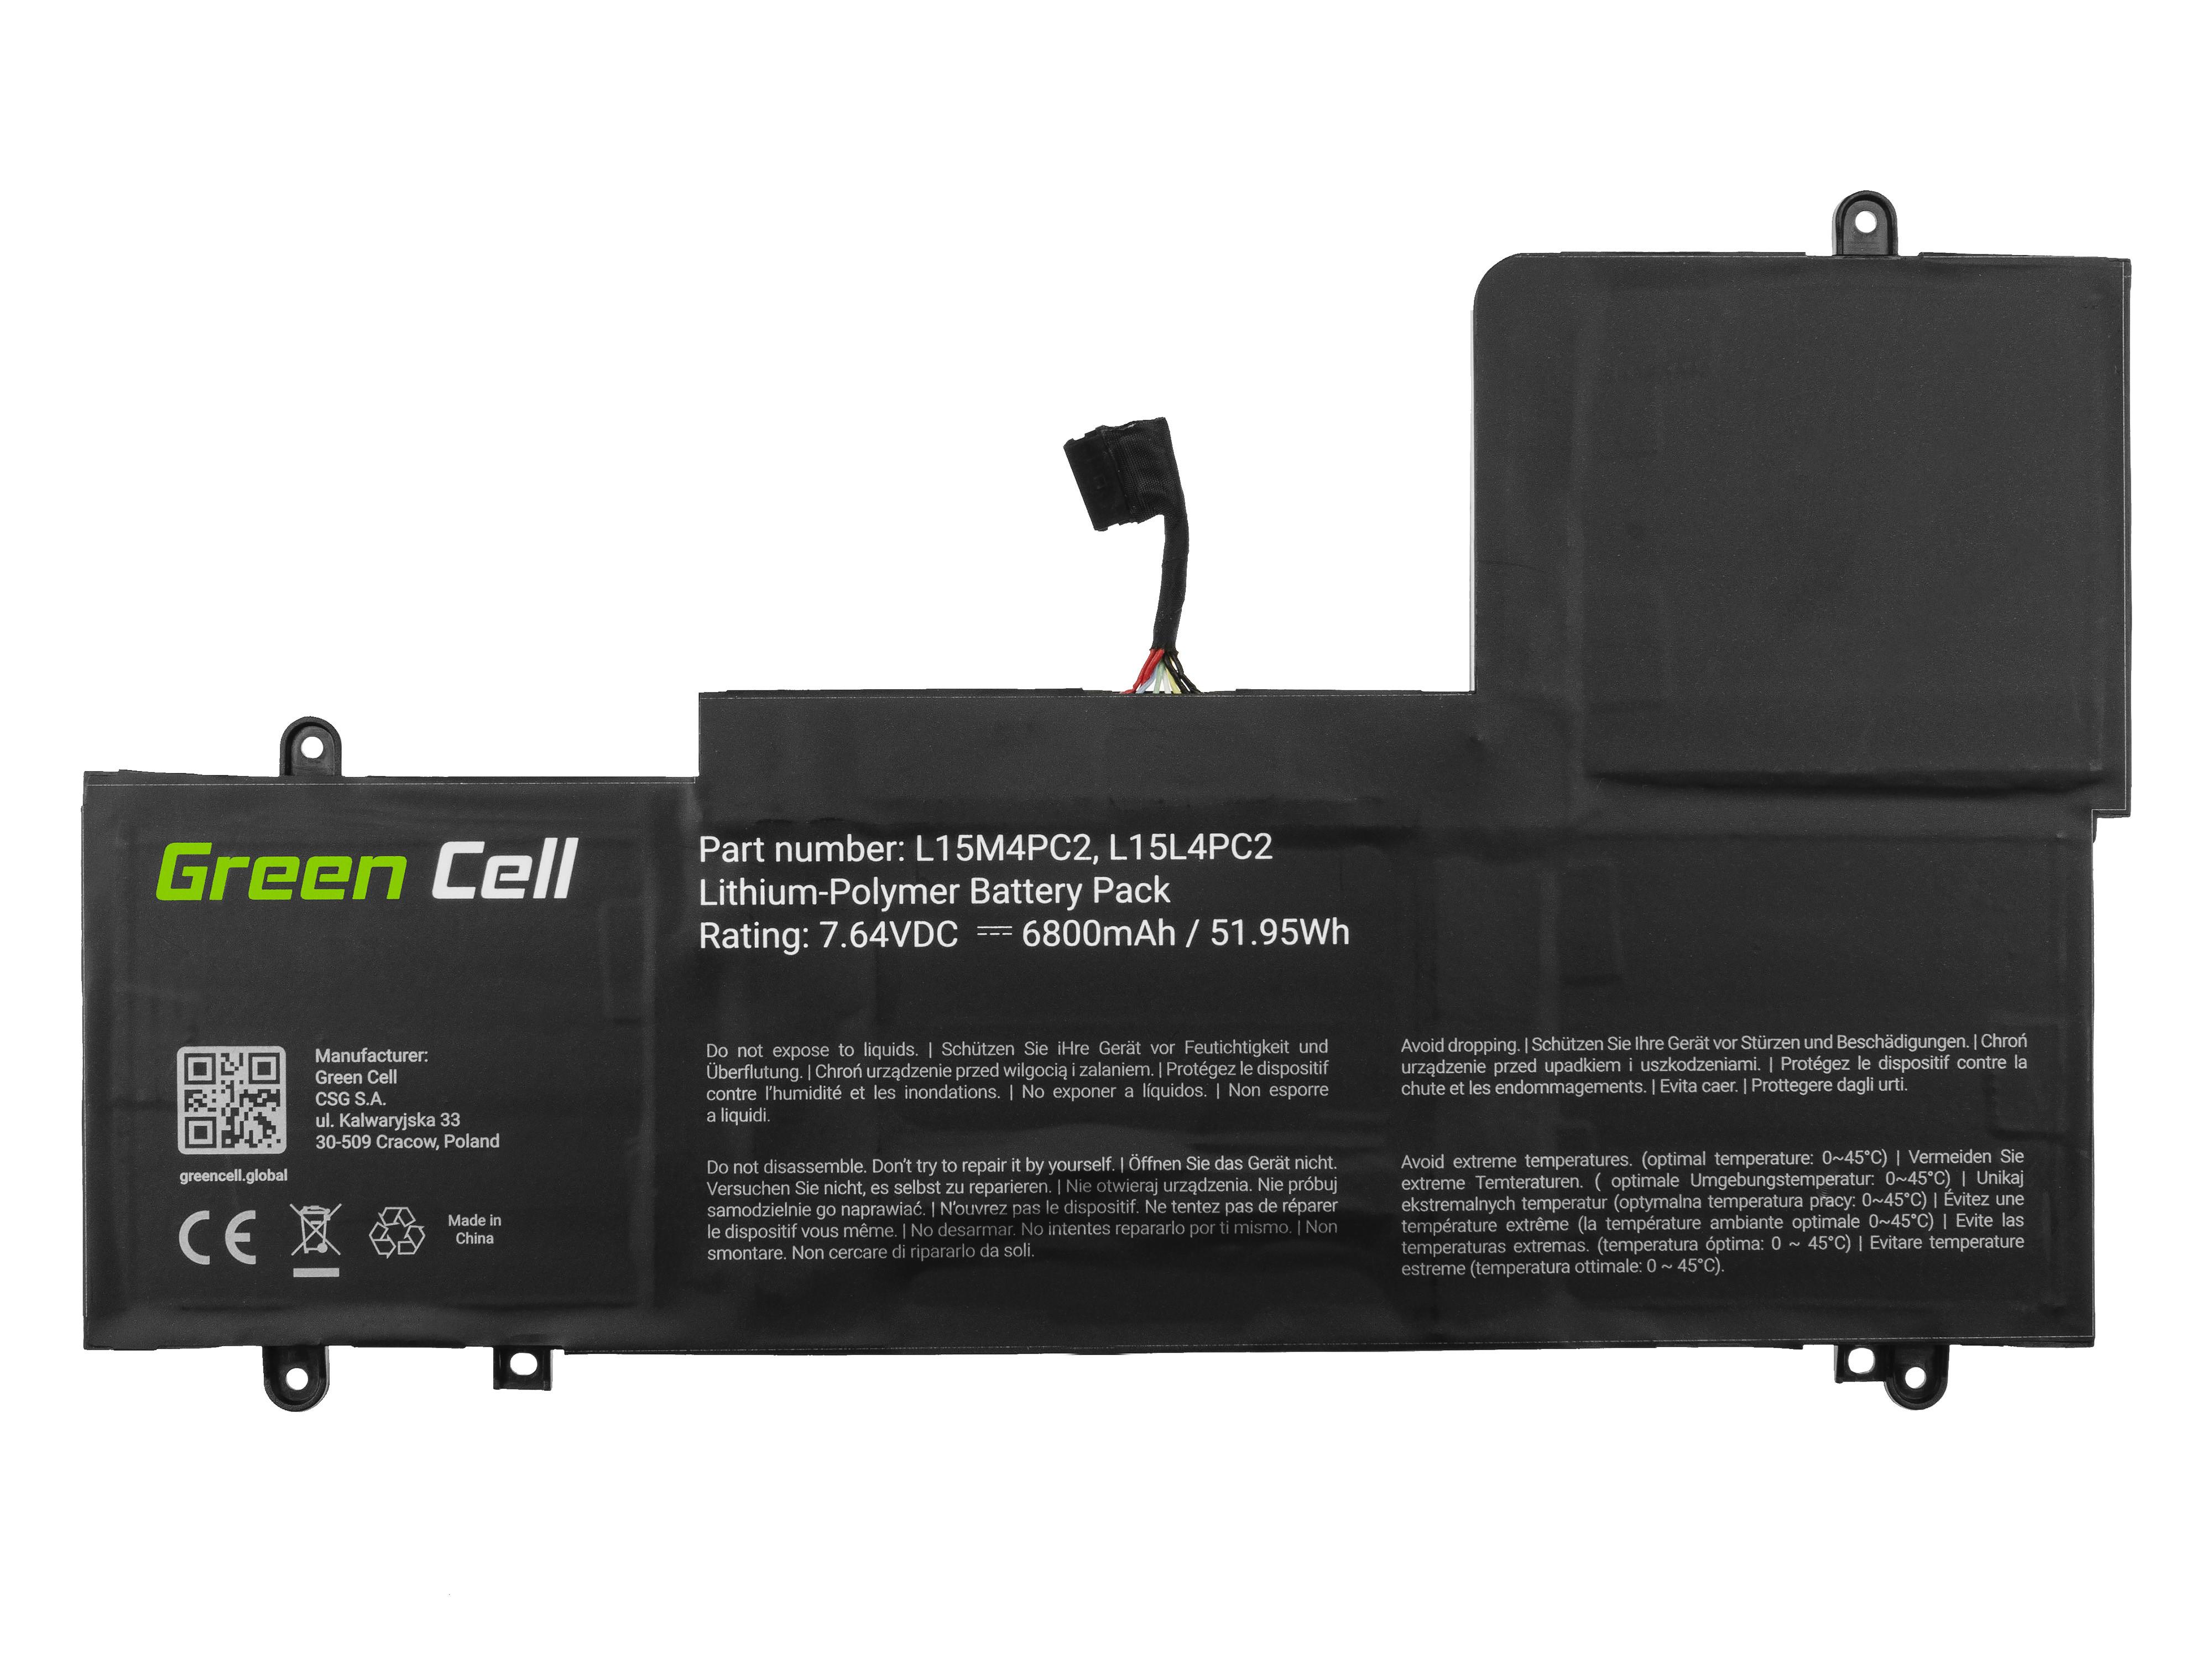 Green Cell LE155 Baterie Lenovo L15L4PC2 L15M4PC2, Lenovo Yoga 710-14 710-14IKB 710-14ISK 710-15 710-15IKB 710-15ISK 6800mAh Li-Pol – neoriginální